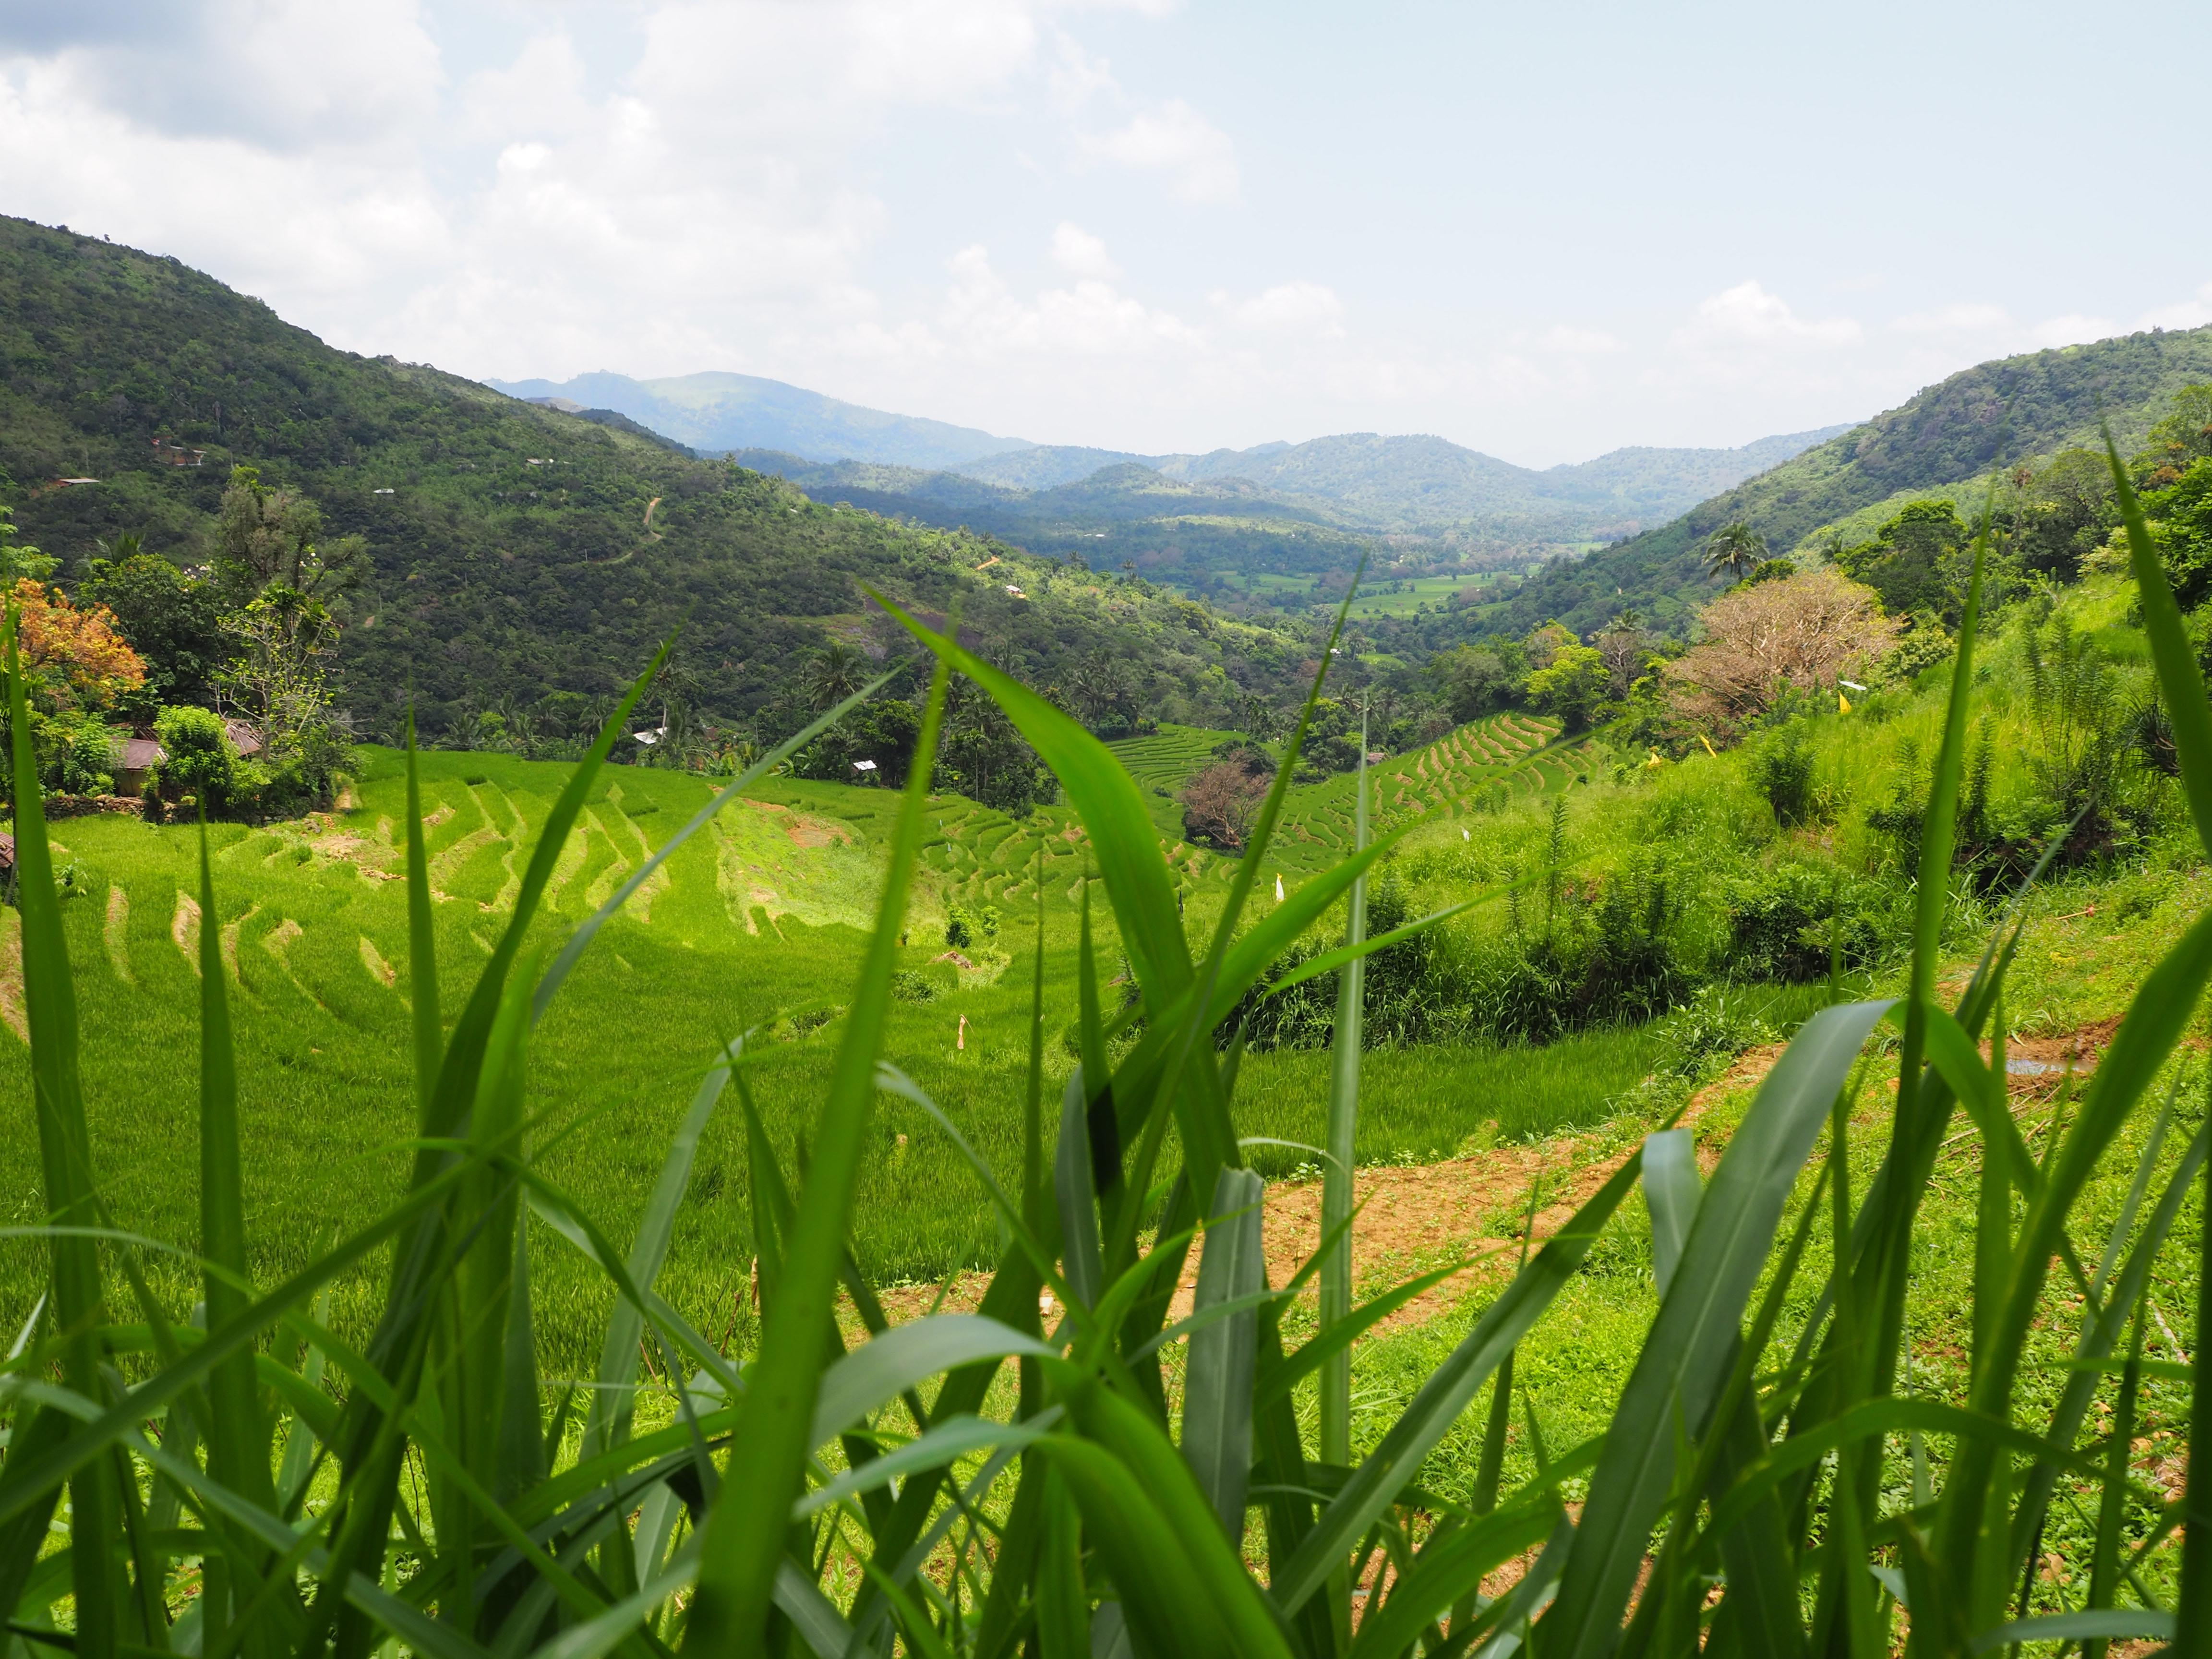 Sri Lanka rice terraces